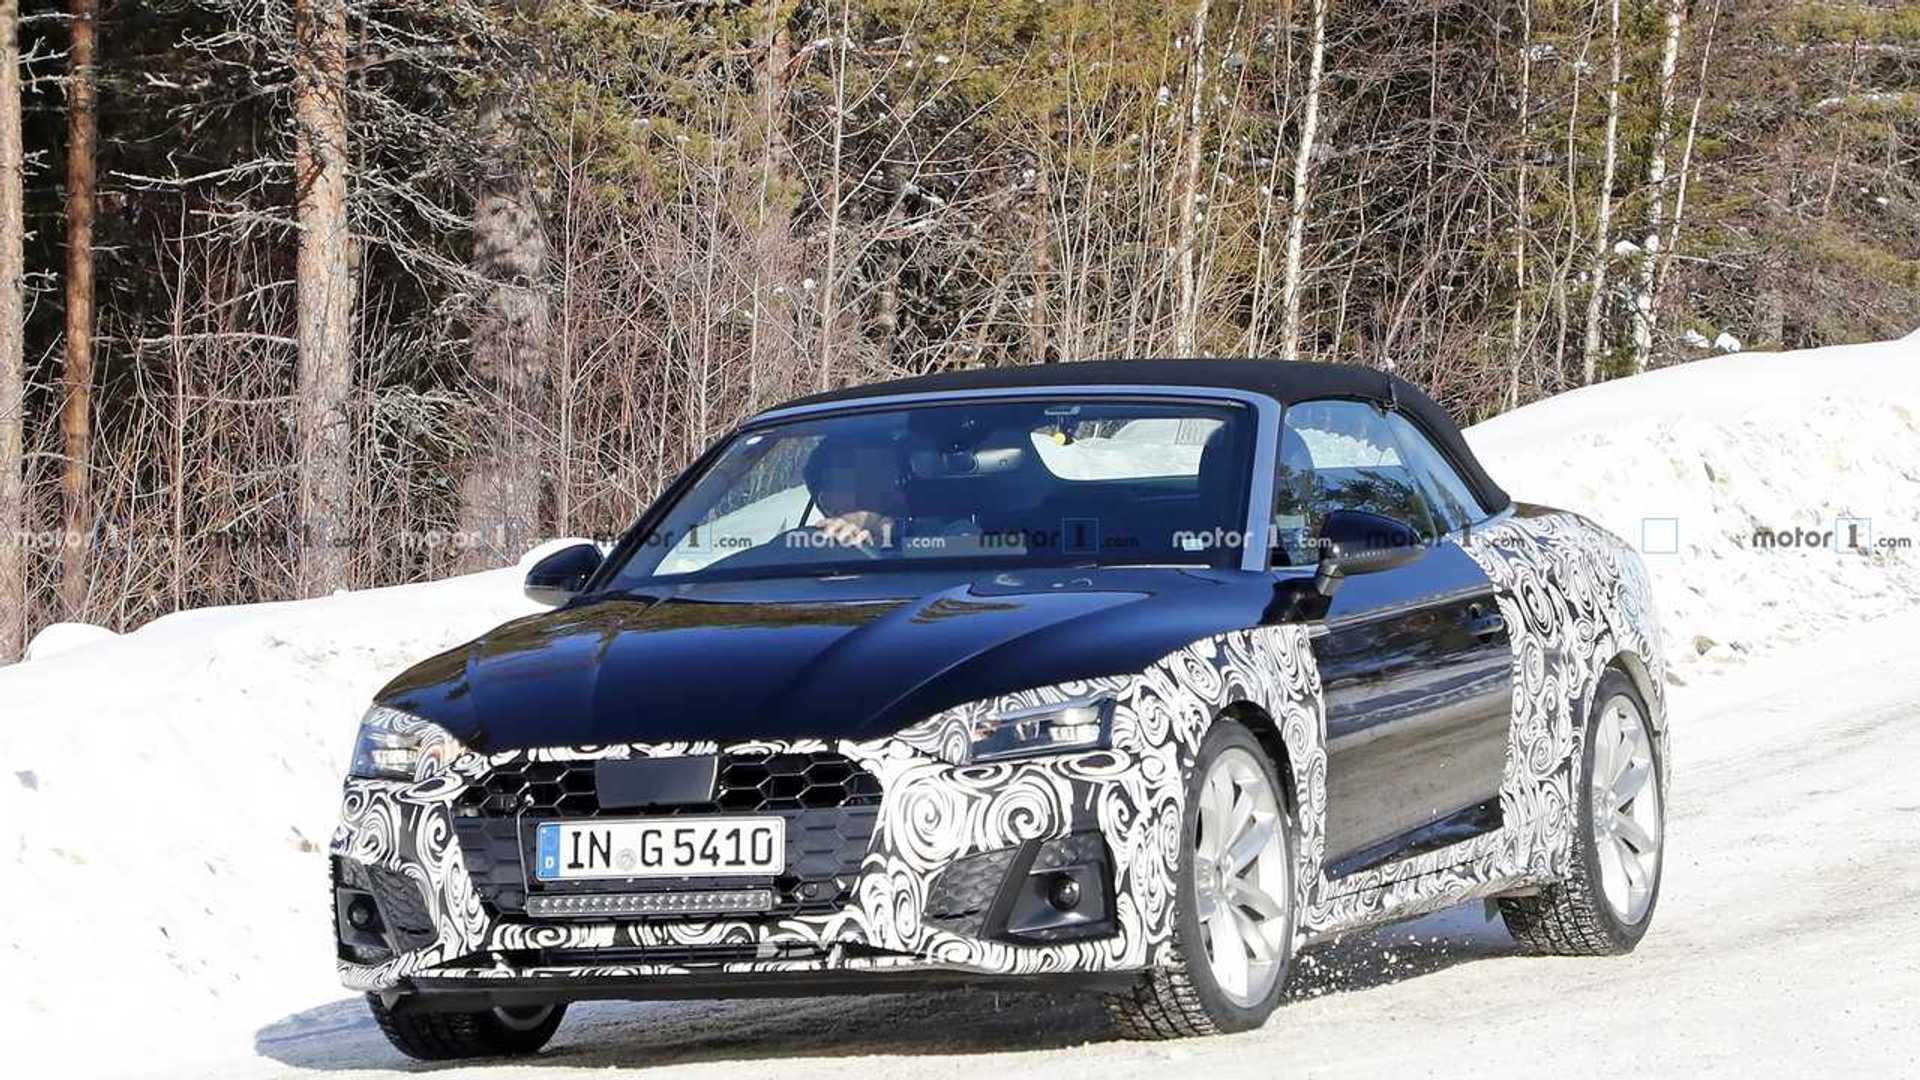 2020 - [Audi] A5 Coupé/Cab/SB restylée Audi-a5-convertible-facelift-first-spy-photo